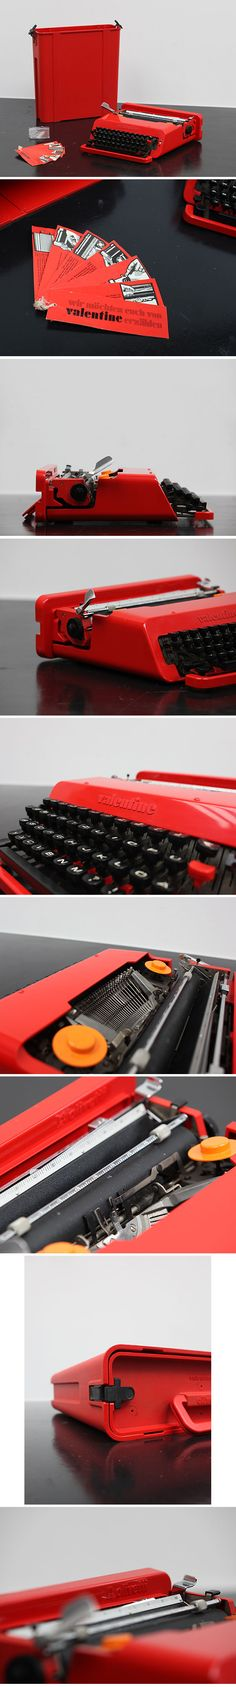 Ettore Sottsass Valentine typewriter for Olivetti 1969 Complete and well kept Ettore Sottsass. Valentine typewriter for Olivetti, 1969. ABS plastic and other materials, 11.7 x 34.3 x 35.2 cm. 'Ettore Sottsass: Work in Progress', Design Museum, London. City Furniture.be. online